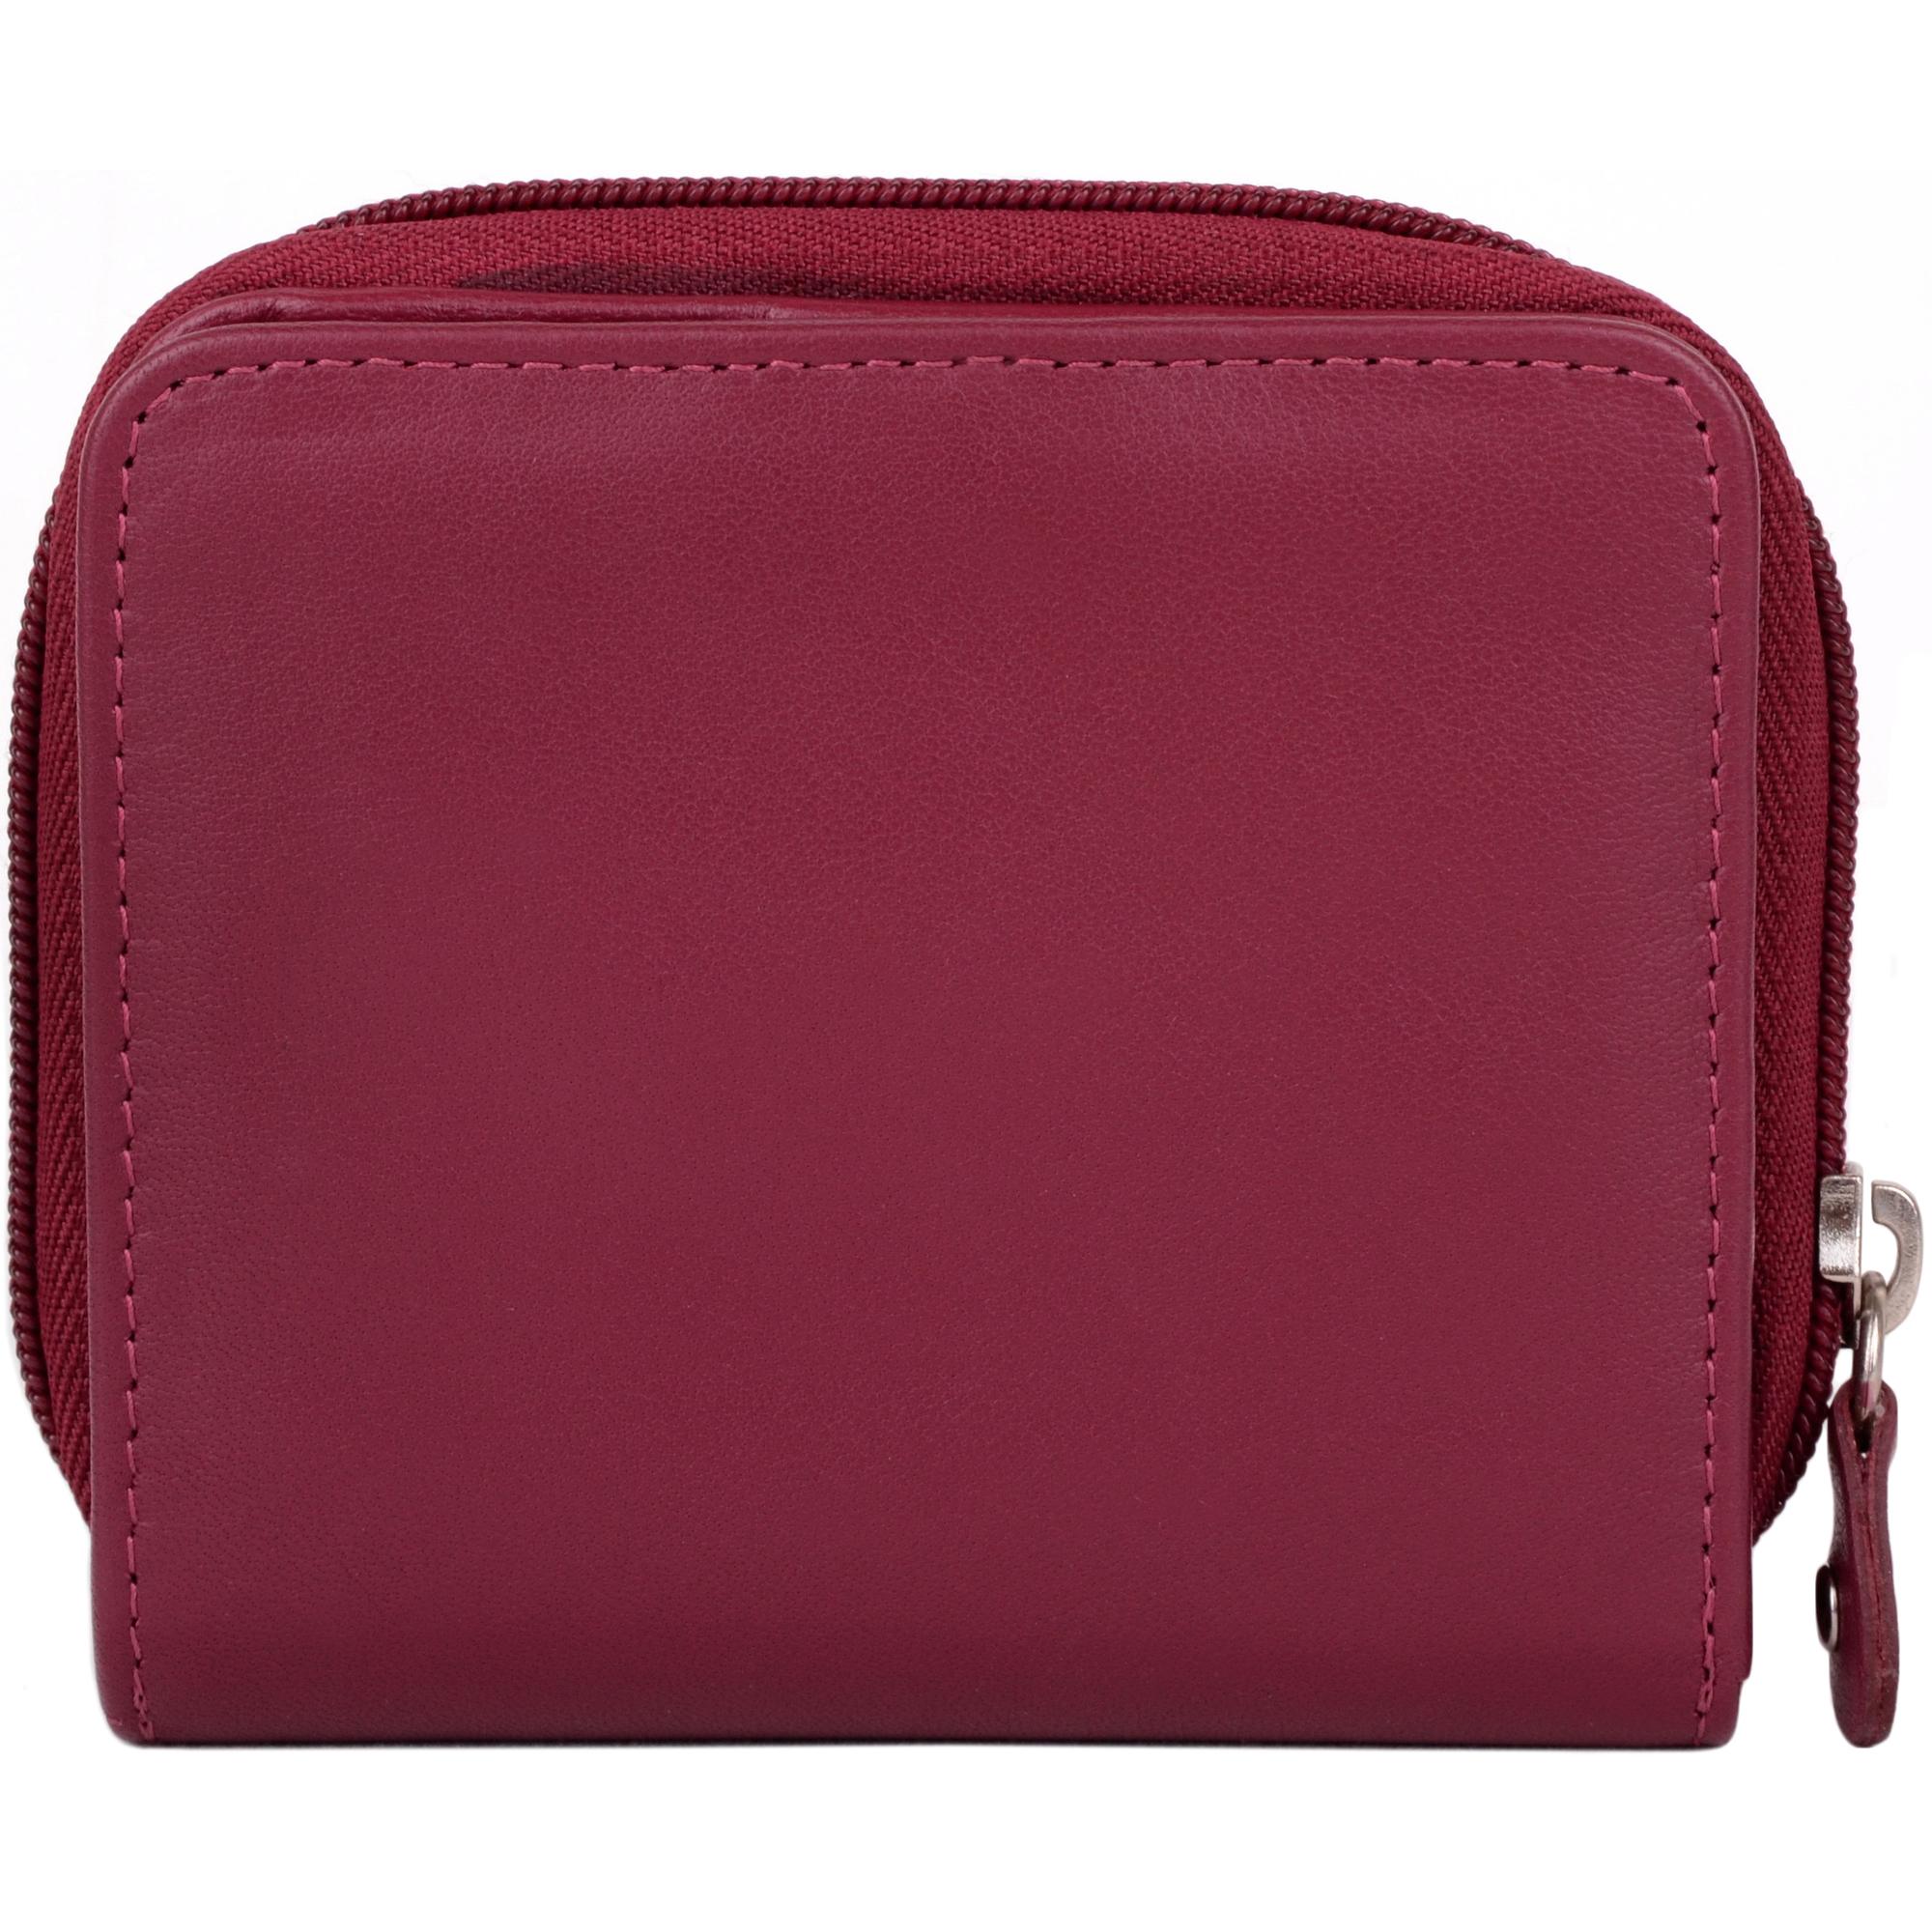 Small Soft Leather Purse - Alexa